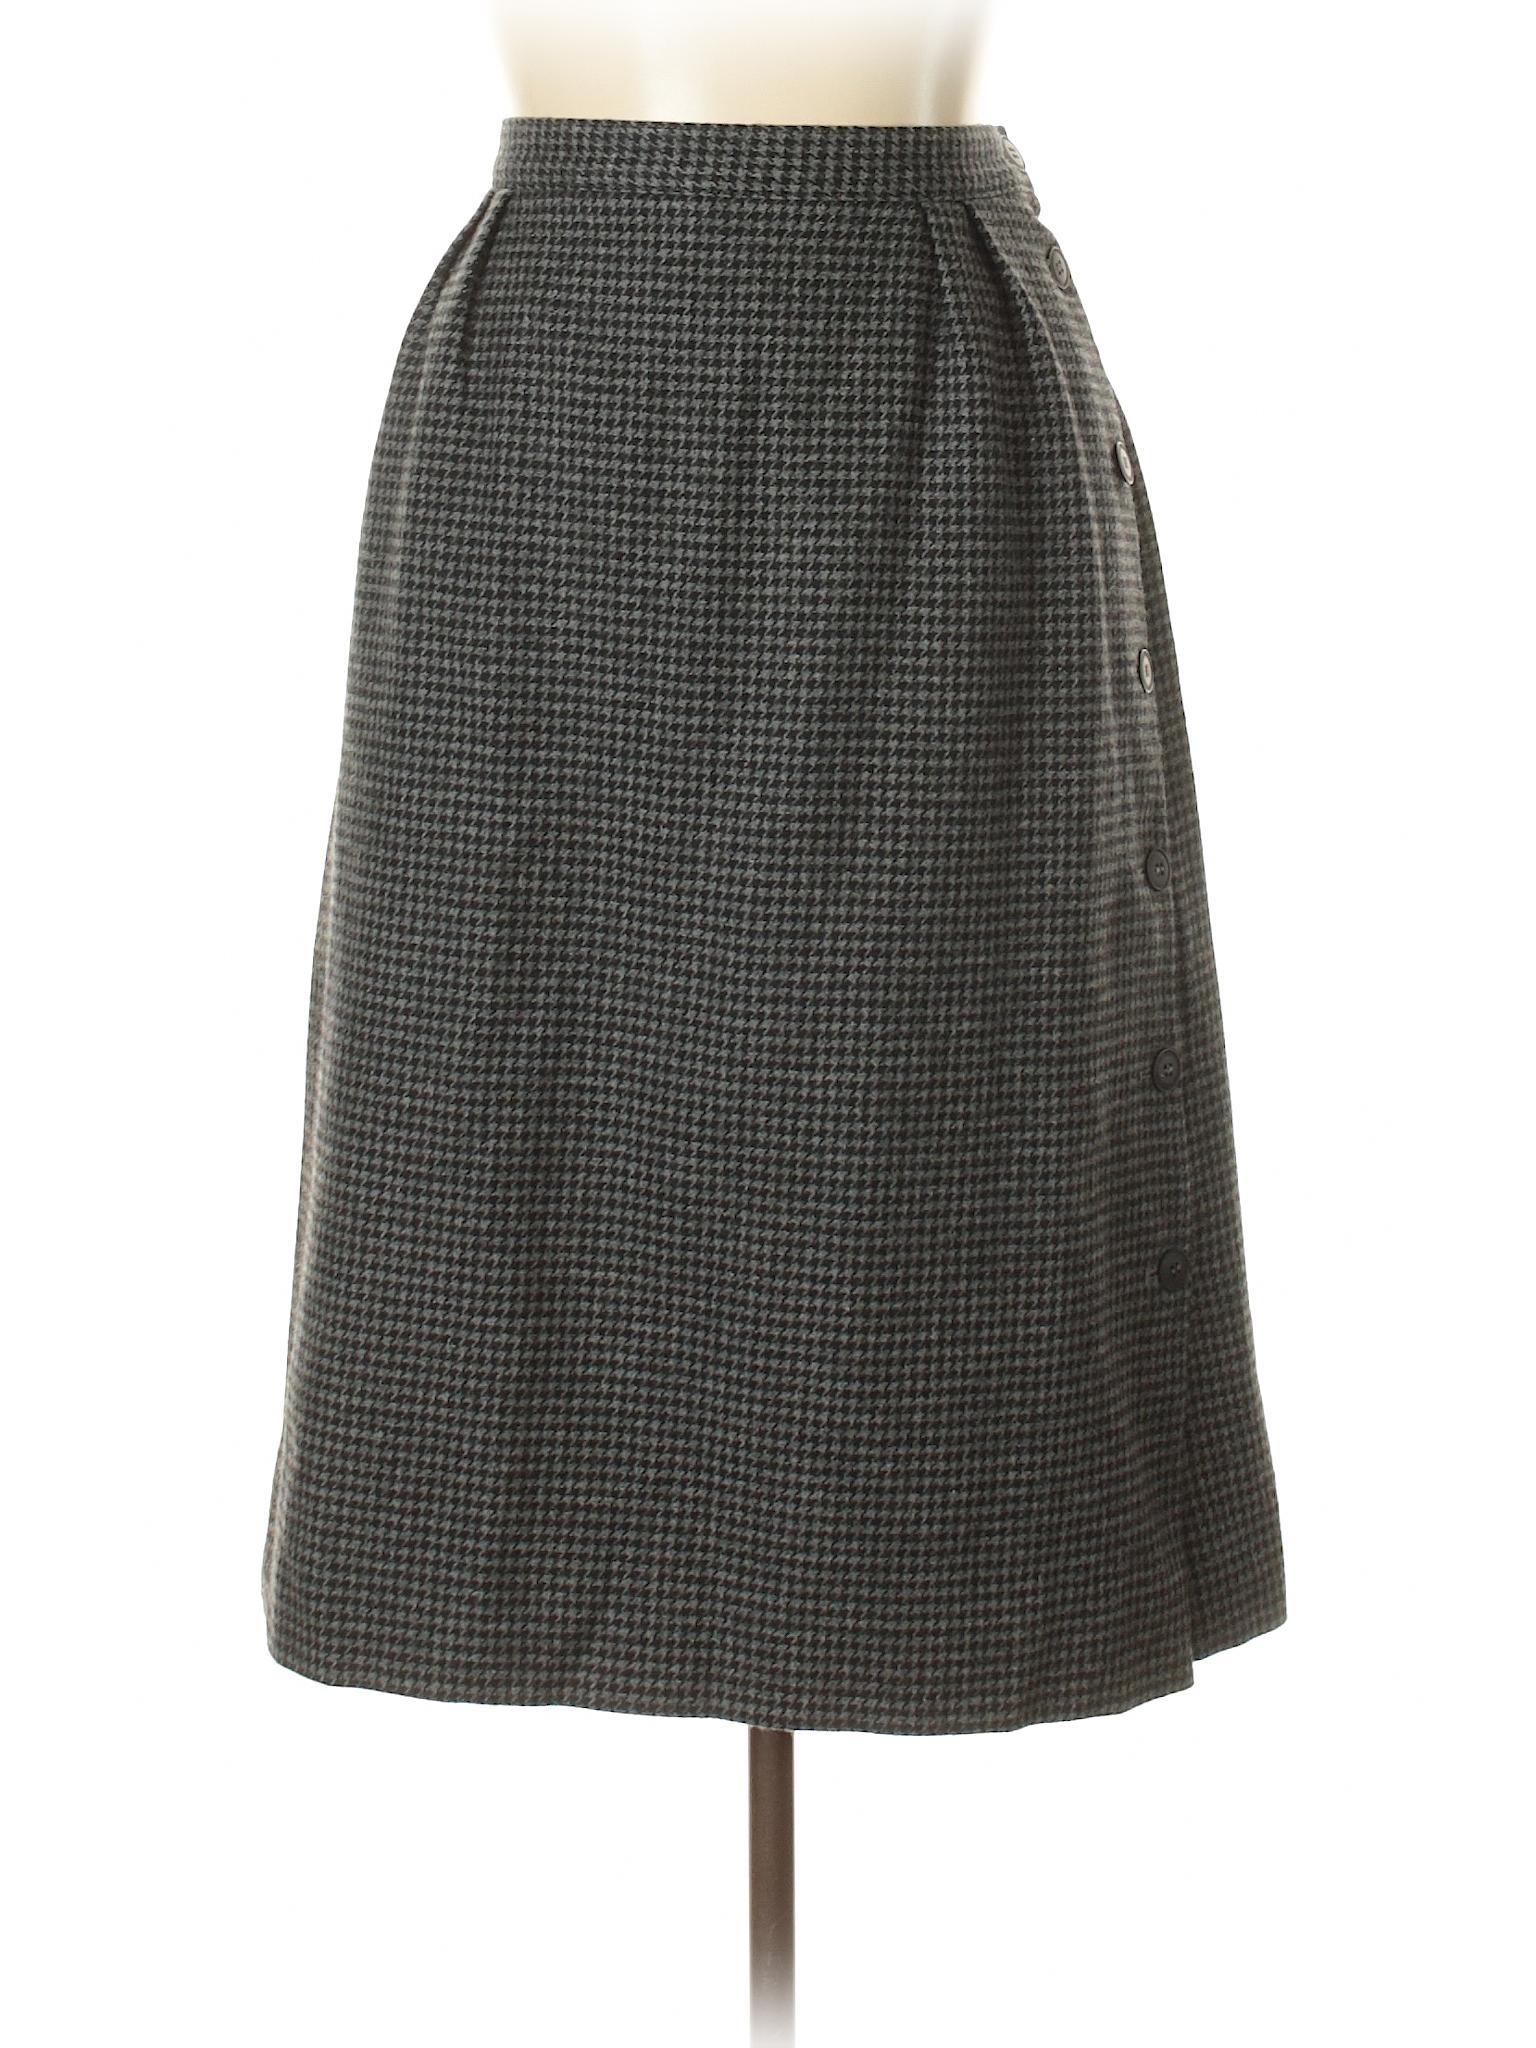 Wool Skirt Boutique Boutique Wool xwE7qI8H